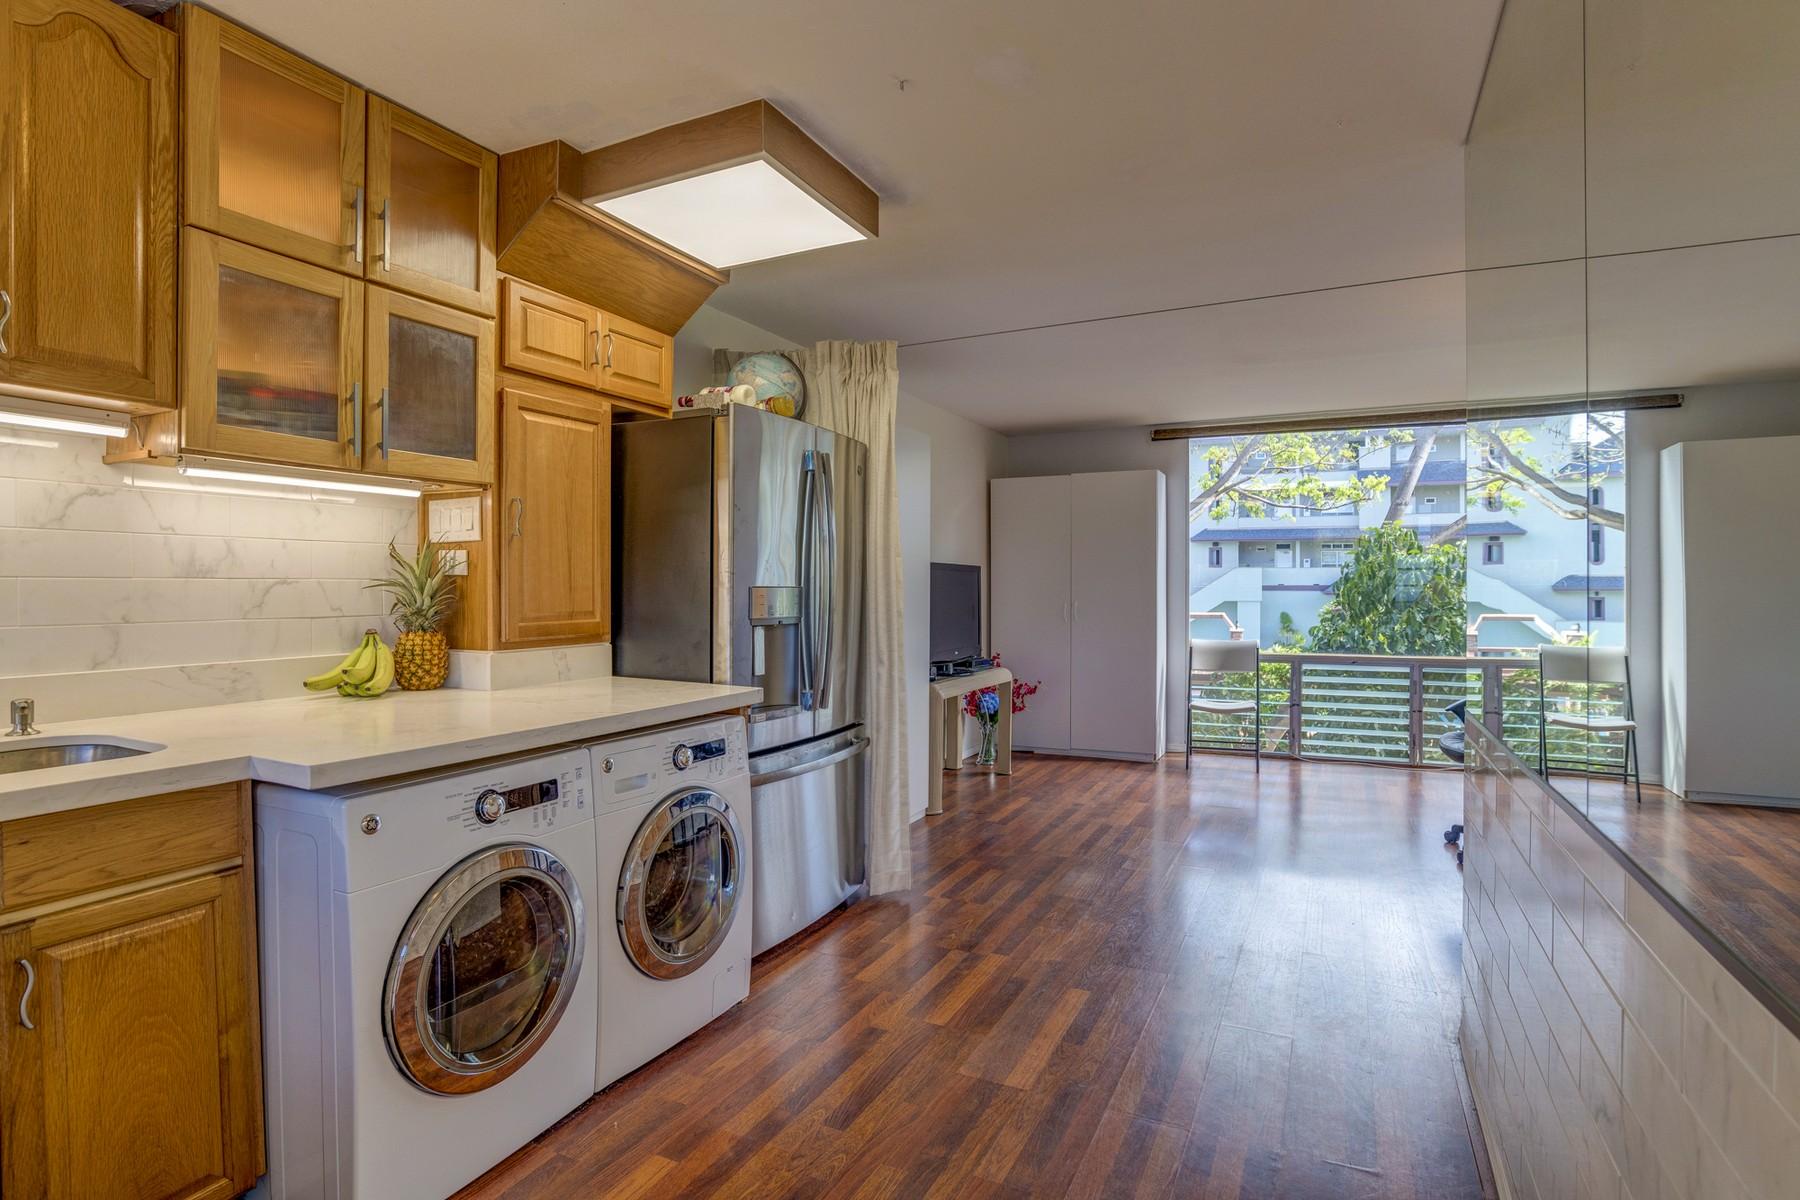 Condominium for Active at Affordable Maui Living 3676 Lower Honoapiilani Rd, West Maui Trades D301 Honokowai, Hawaii 96761 United States